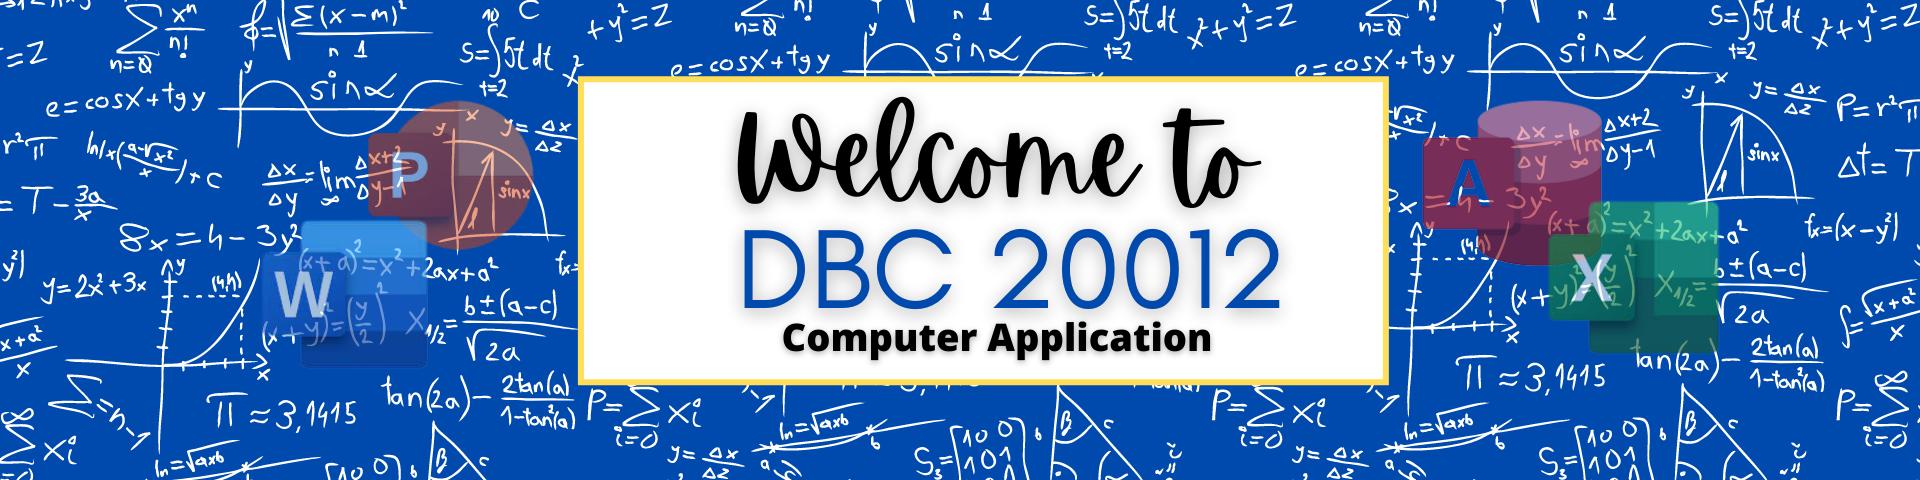 DBC 20012 COMPUTER APPLICATION